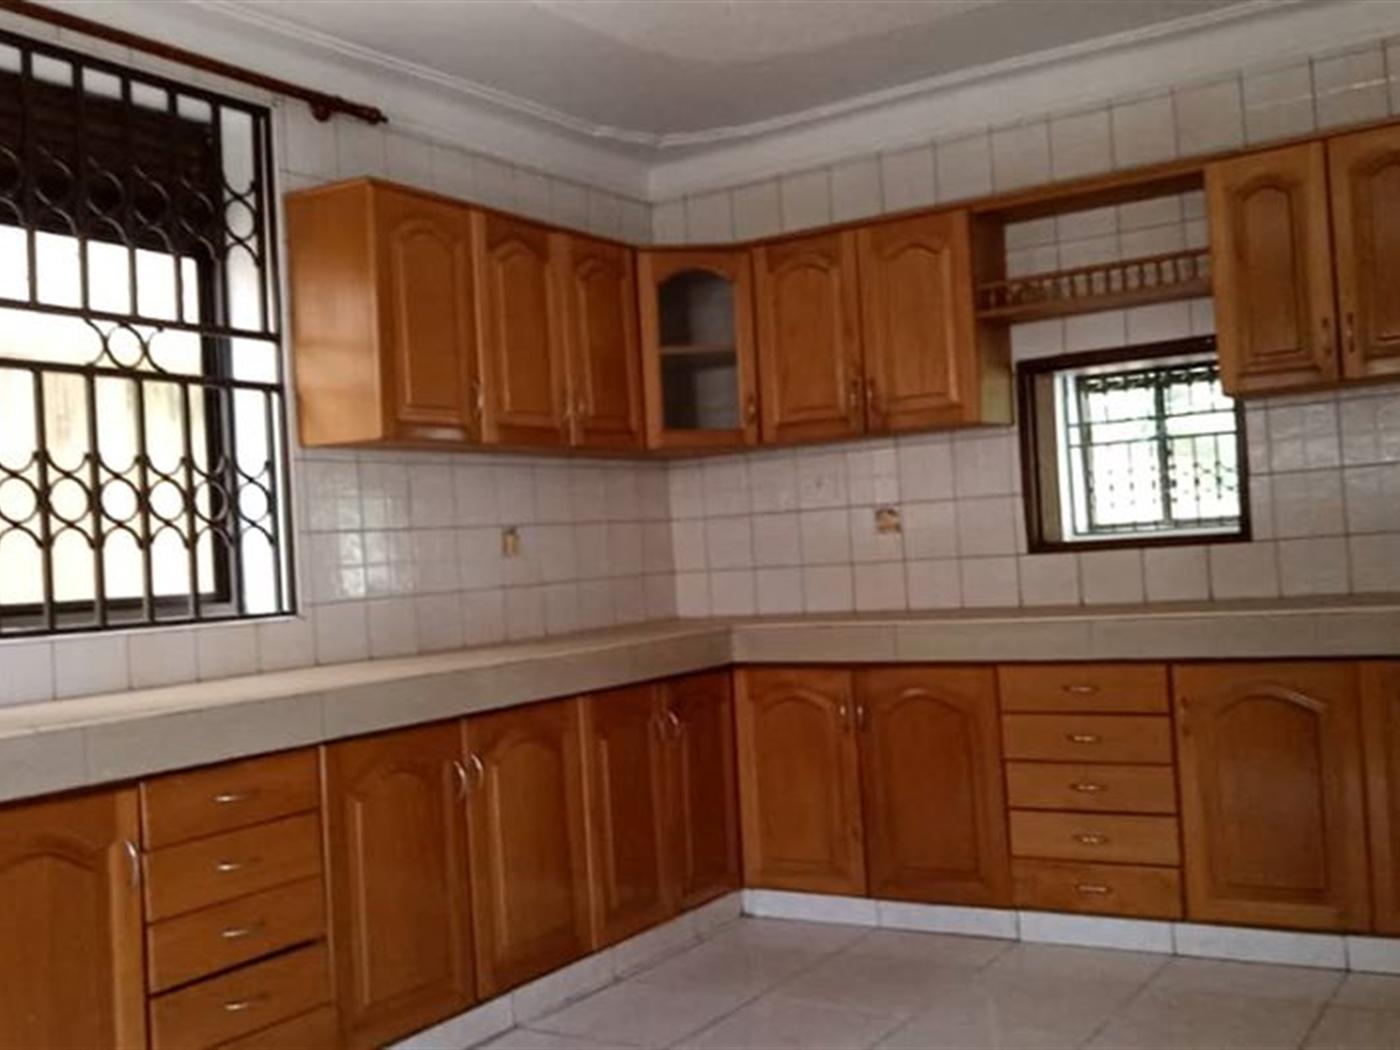 Mansion for sale in Naguru Wakiso